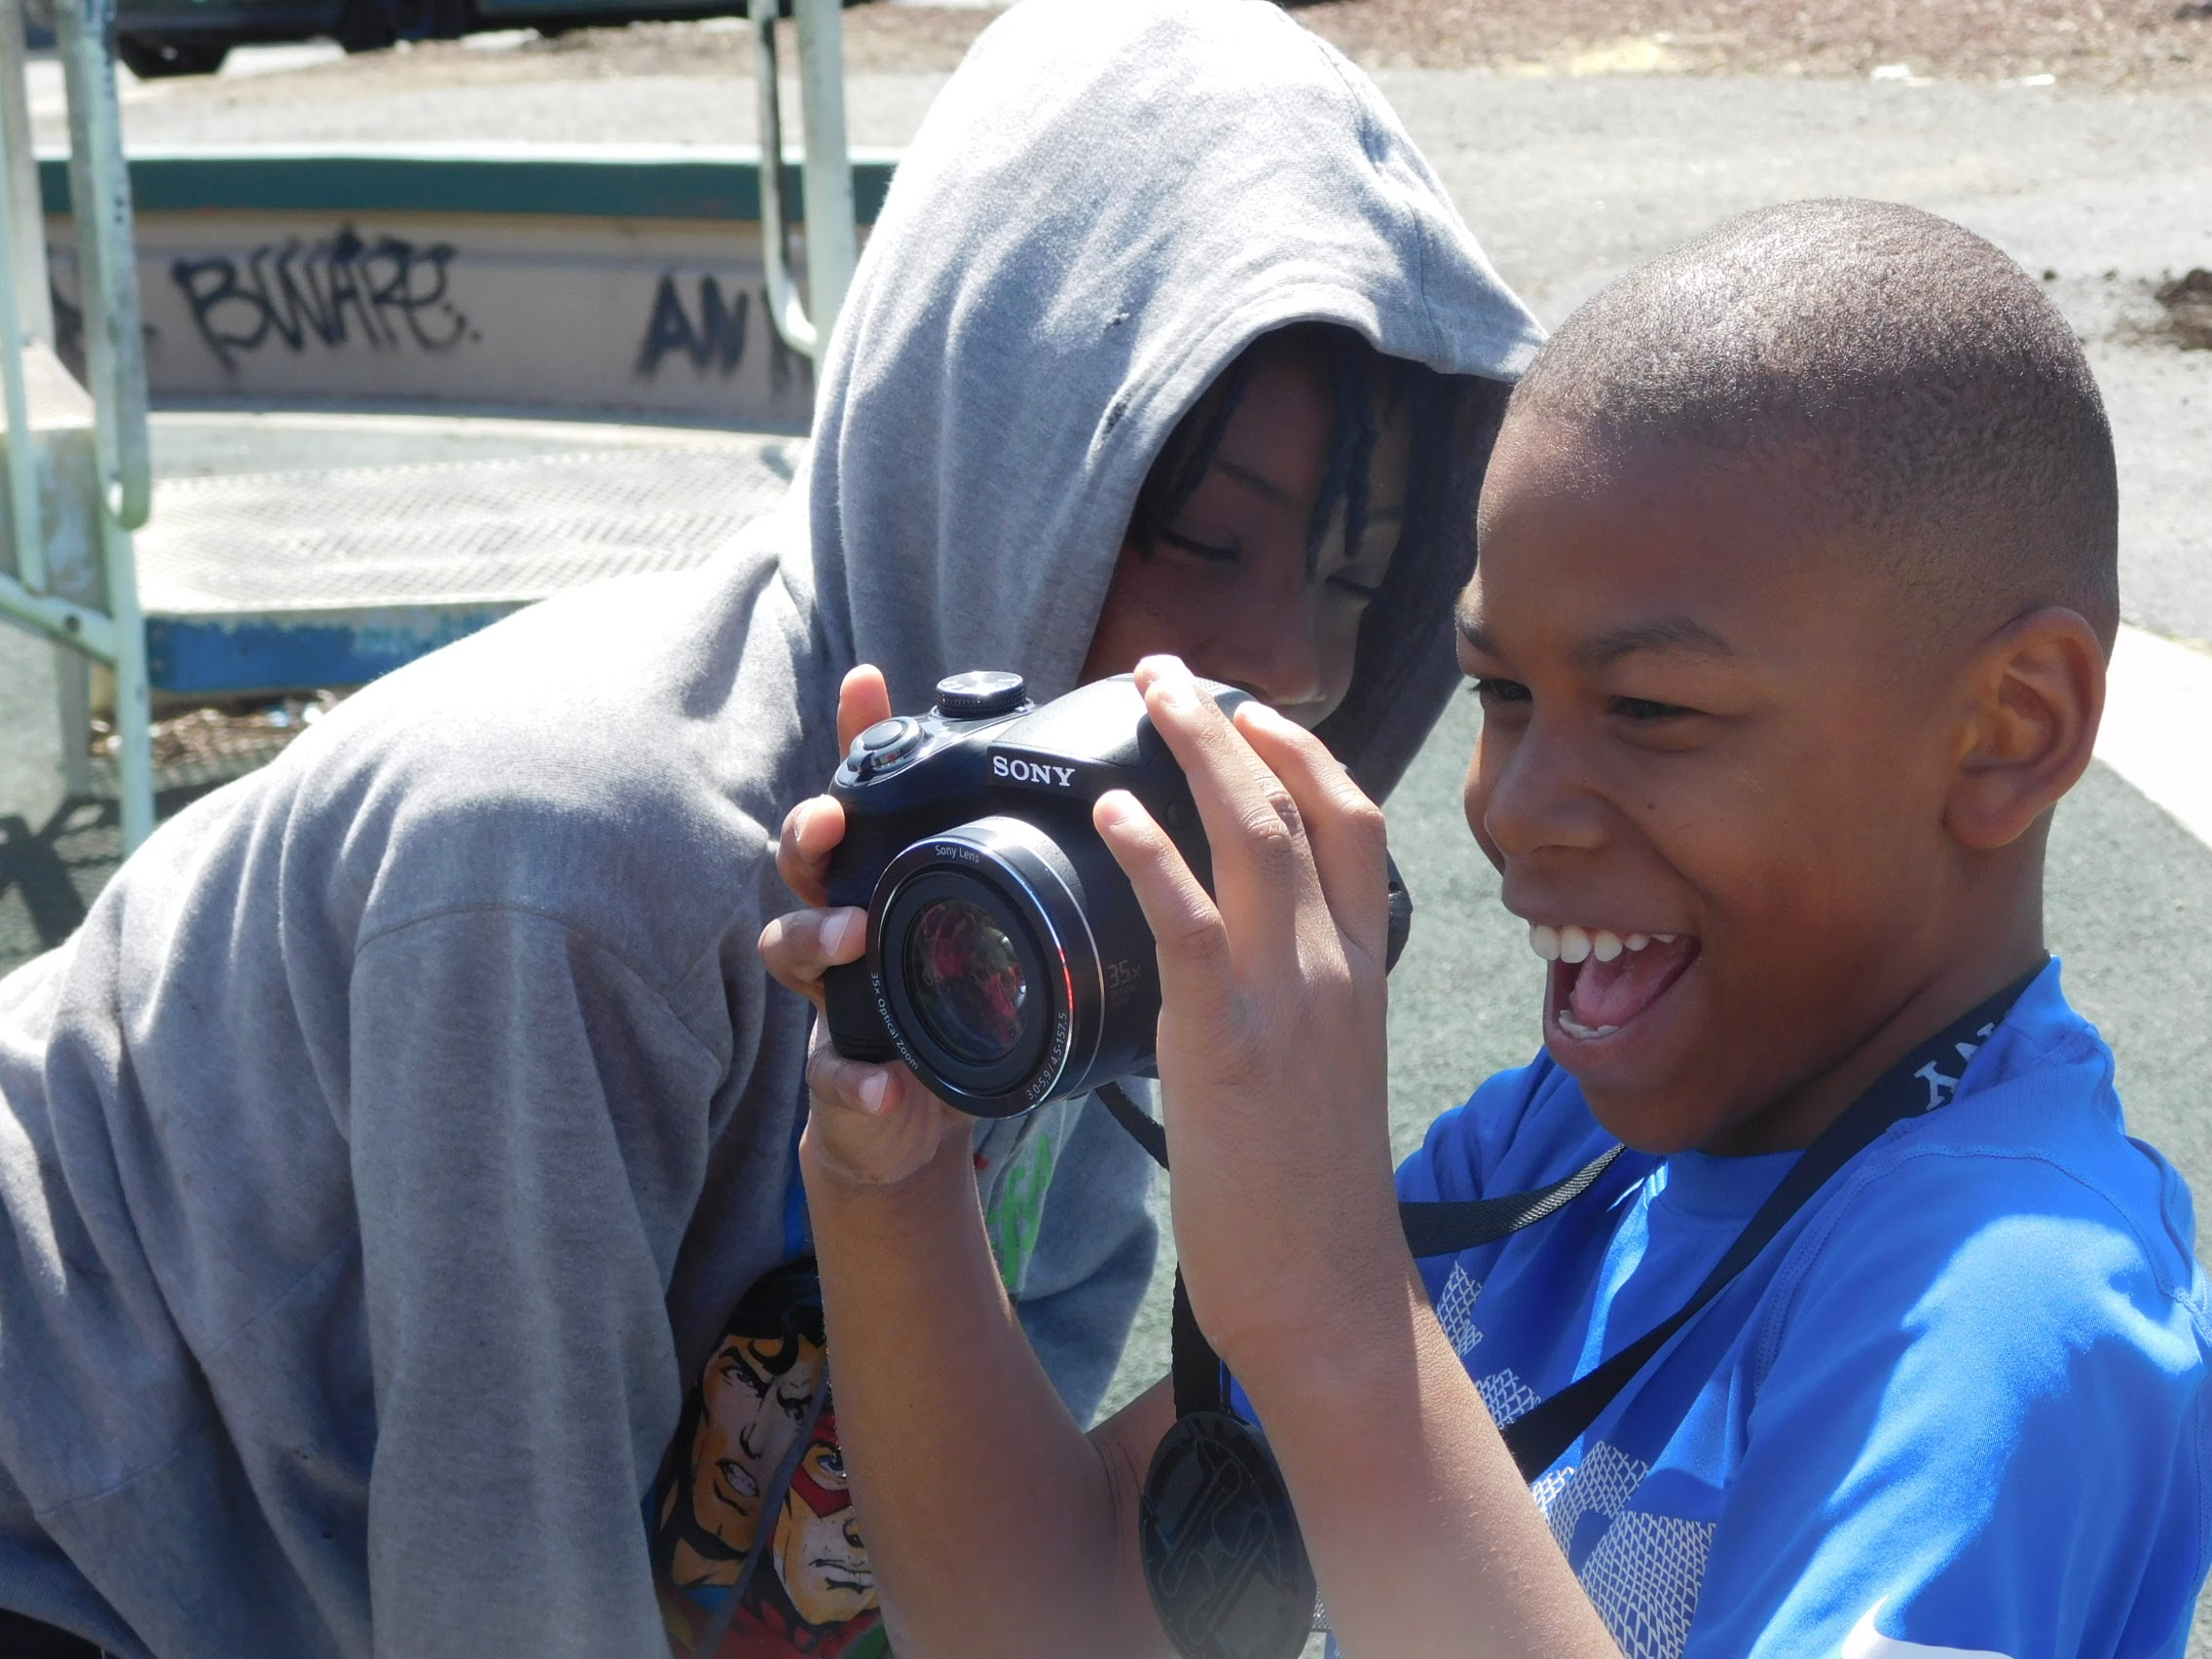 Meet Mixed Media Specialist: Gary (G-Biz) Bizer at Camp ANV!